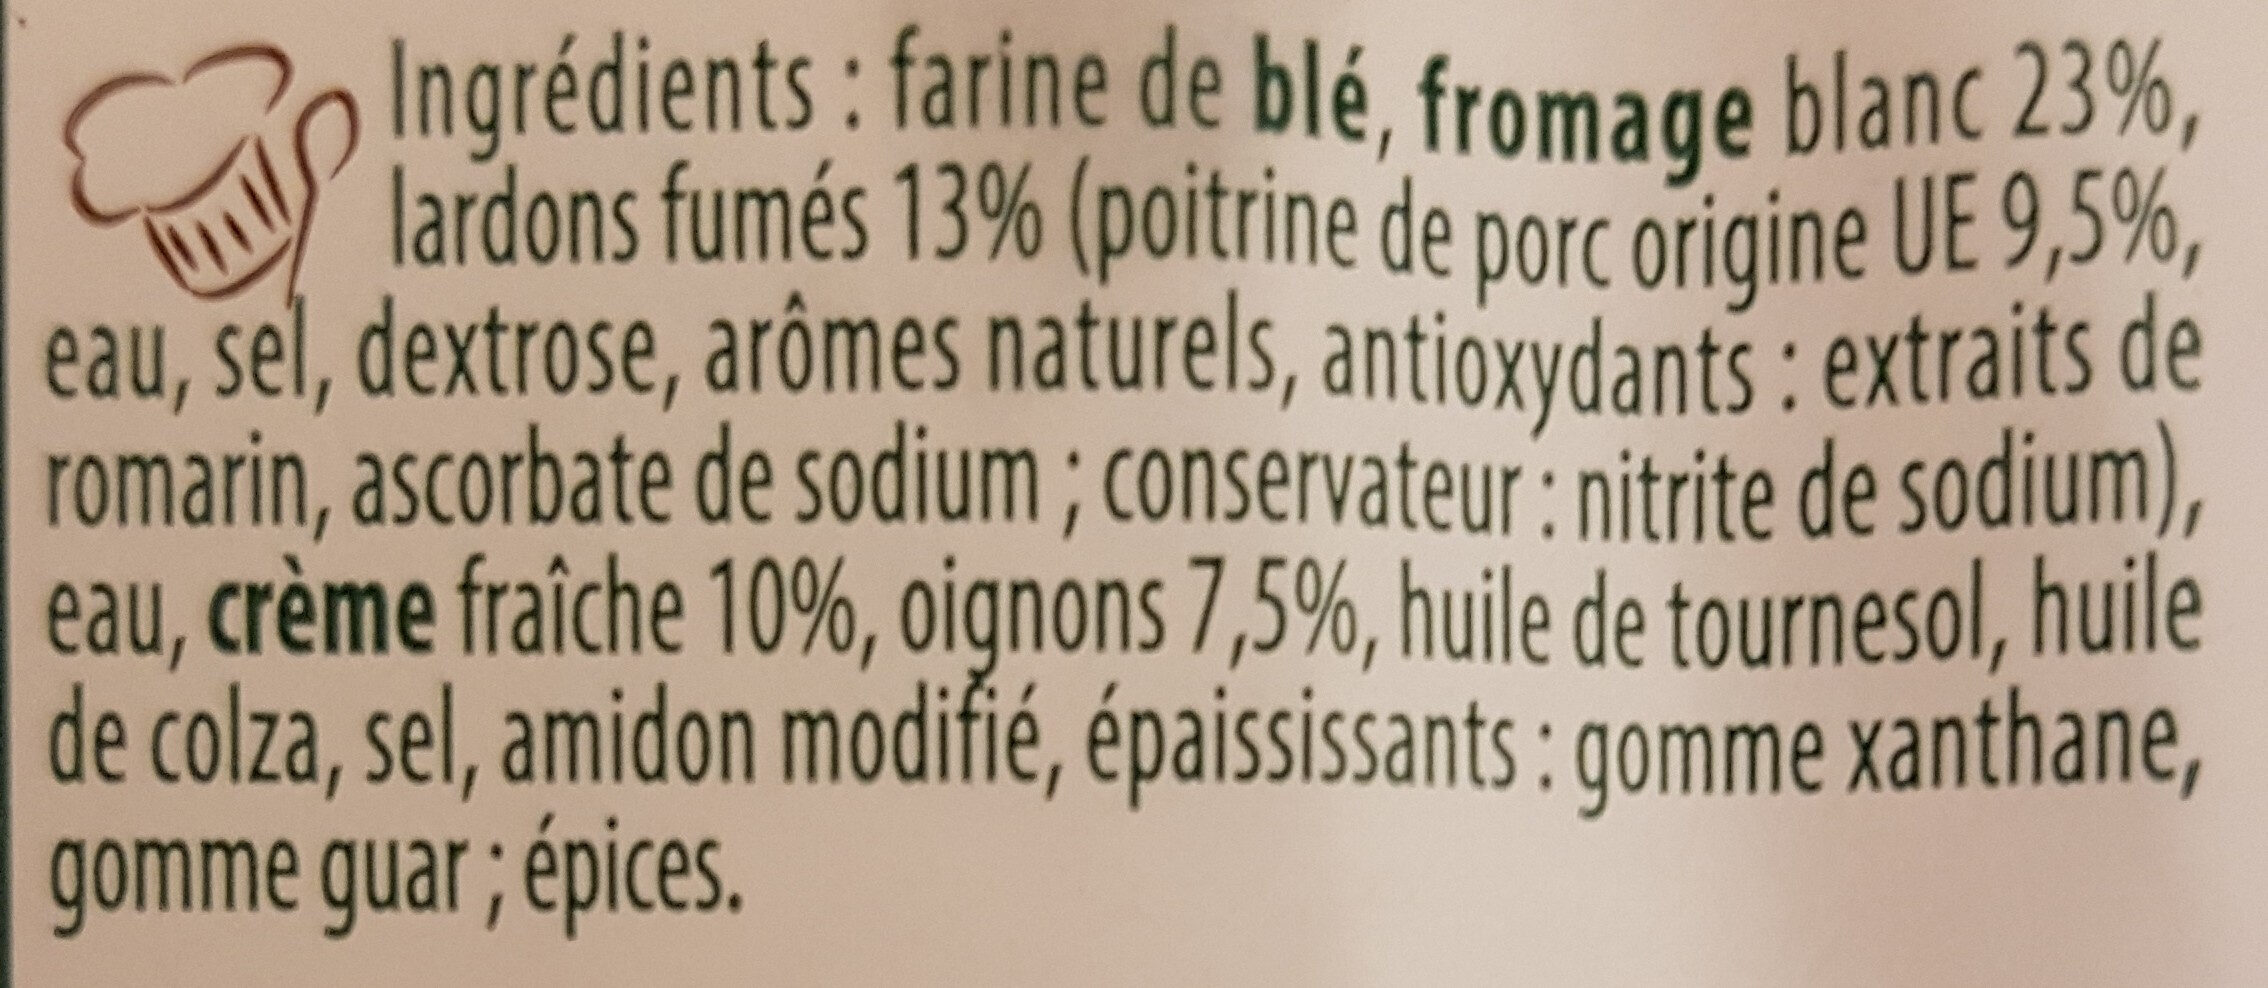 Flammekueche Lardons - Oignons - Ingrédients - fr